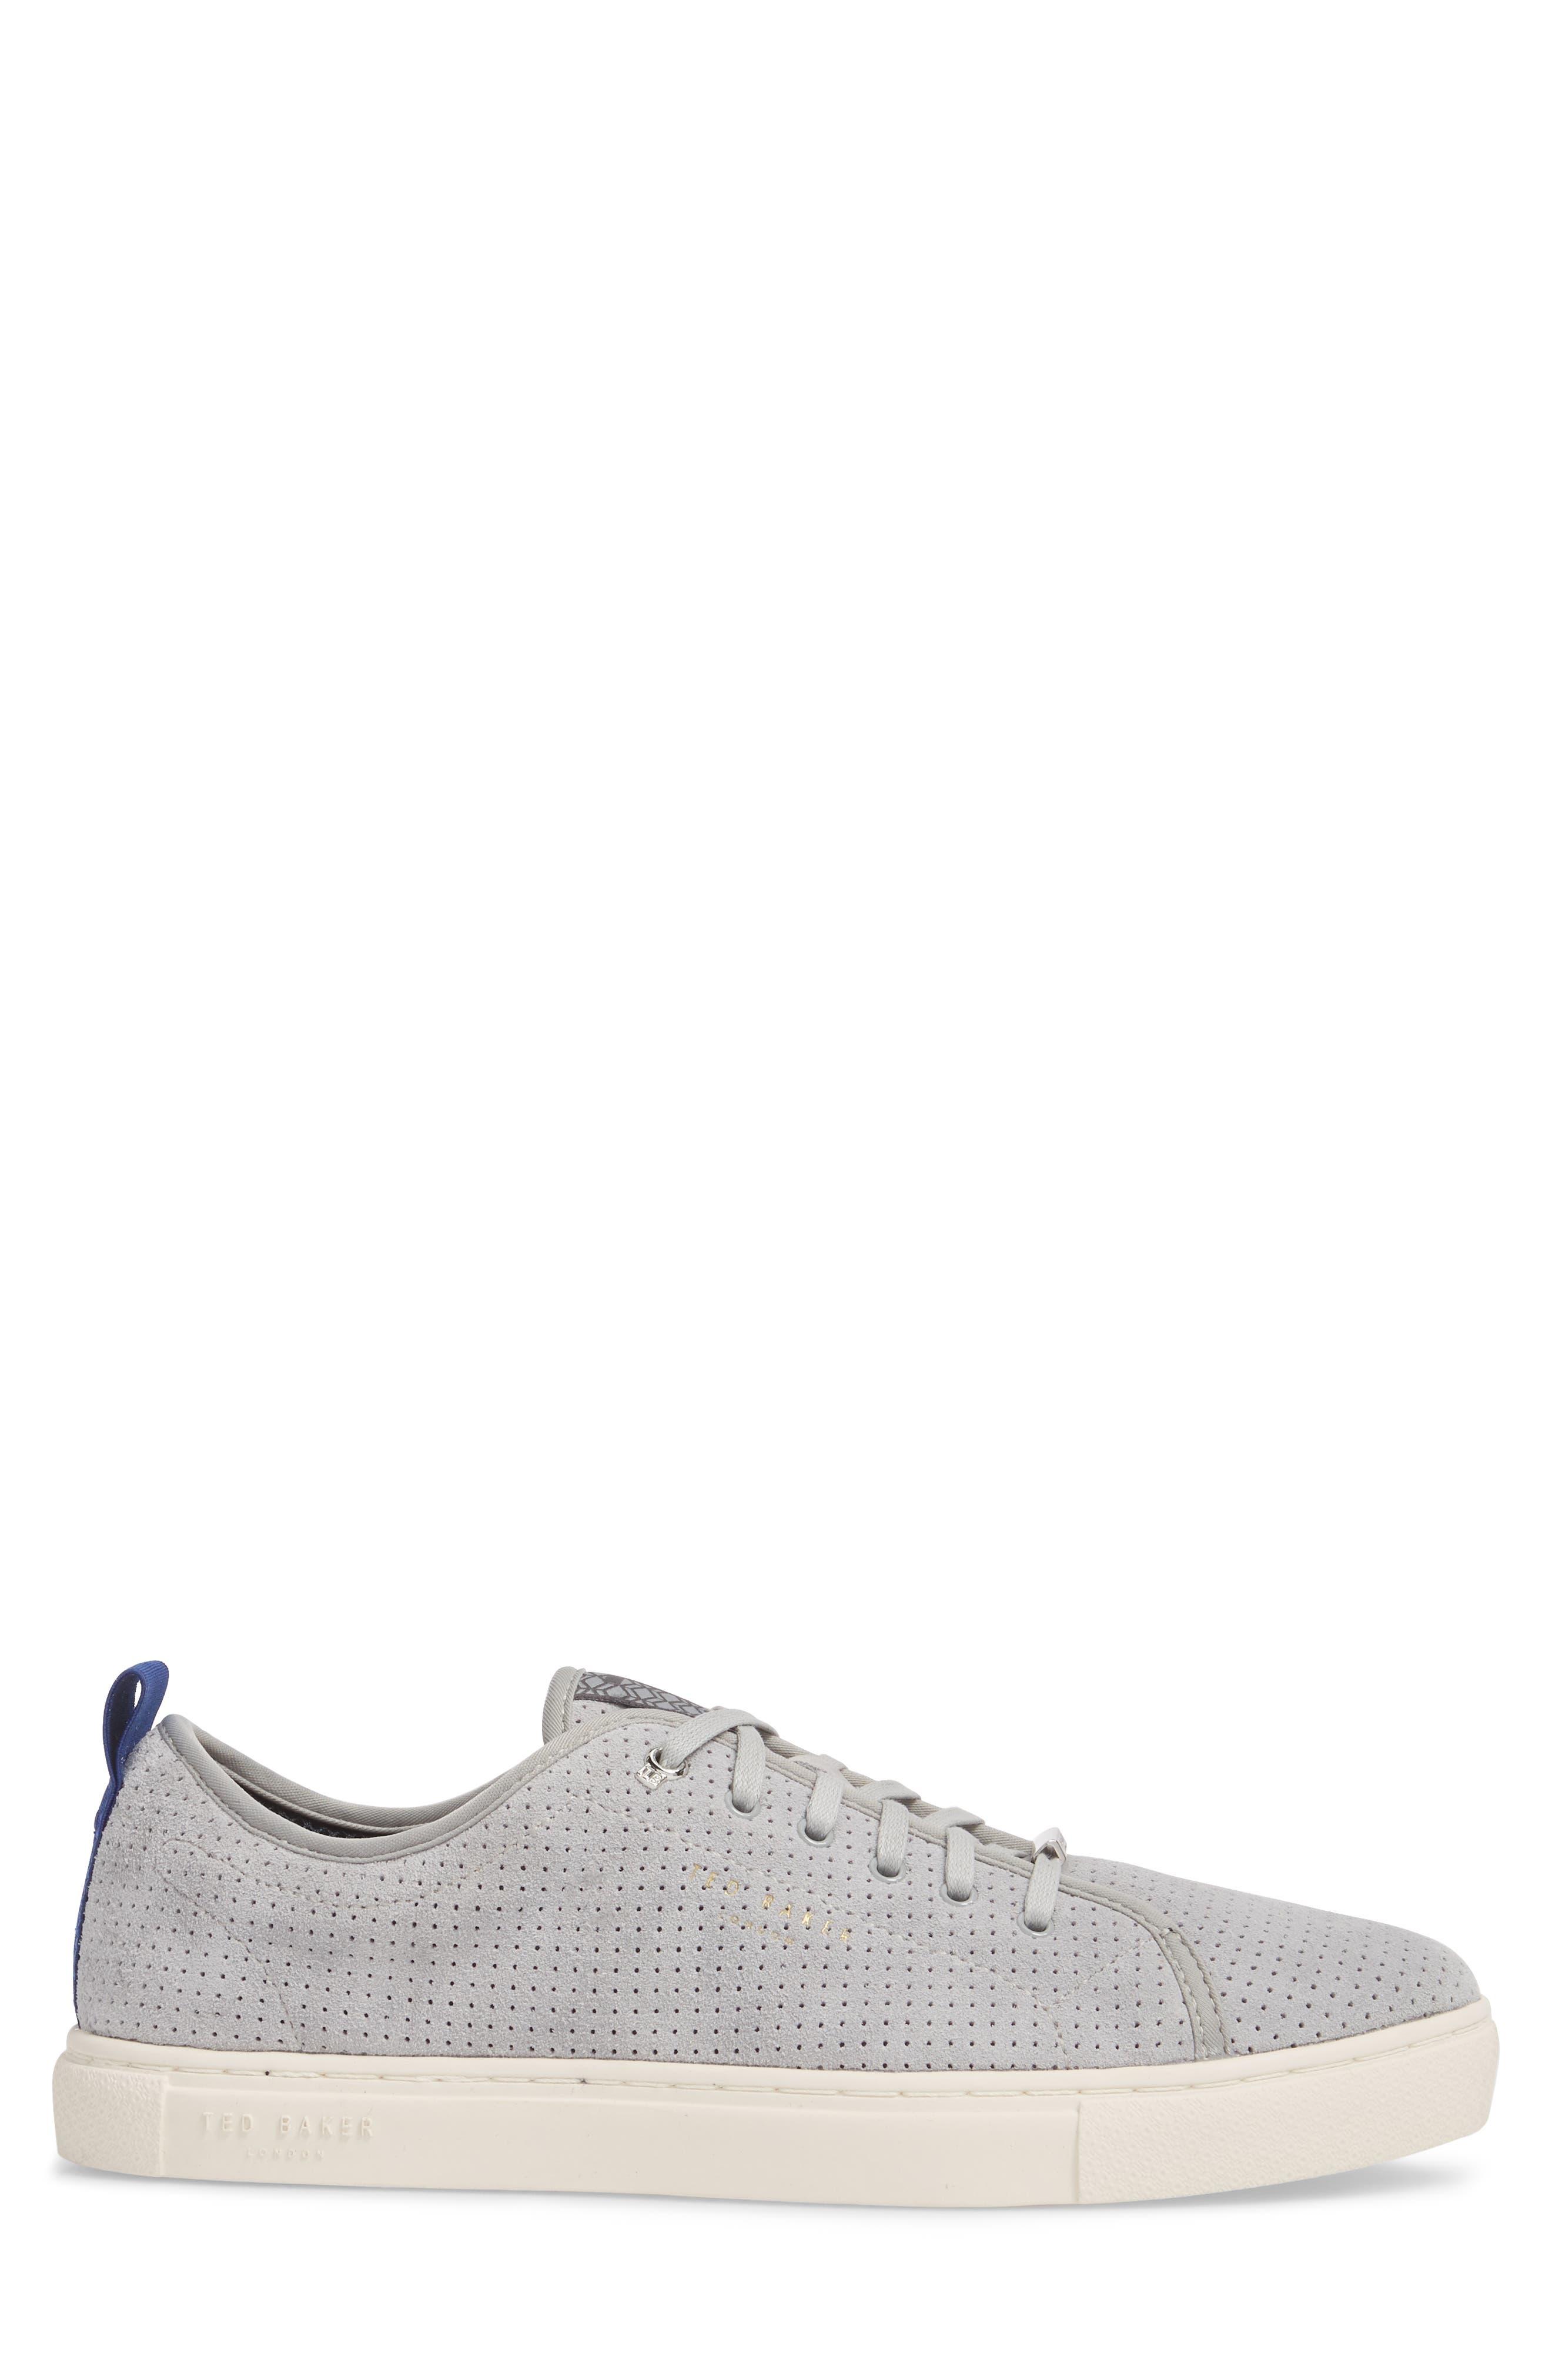 Kaliix Perforated Low Top Sneaker,                             Alternate thumbnail 3, color,                             070